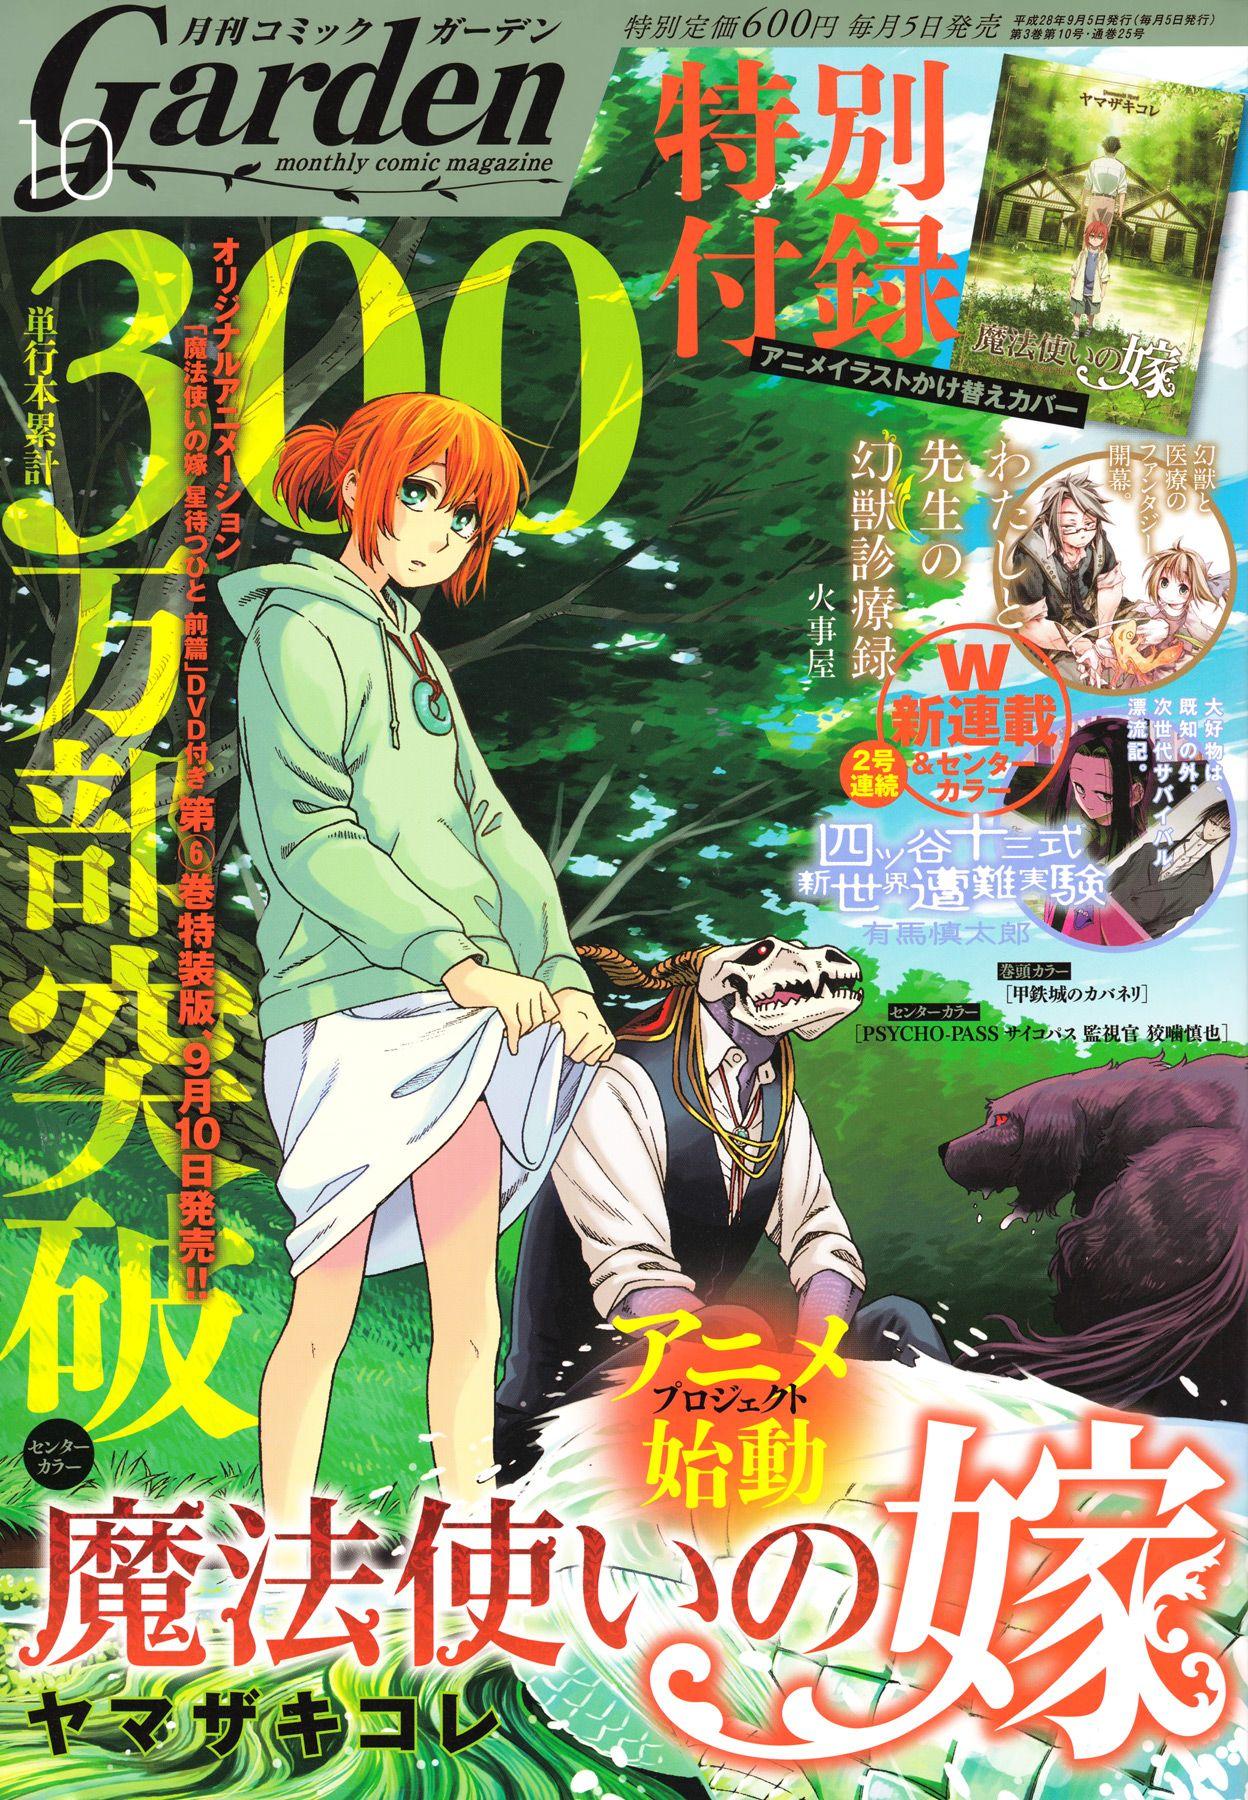 http://c5.ninemanga.com/es_manga/pic2/53/181/502829/e0c5e4ce2af501bca32abadcf9030c6b.jpg Page 1